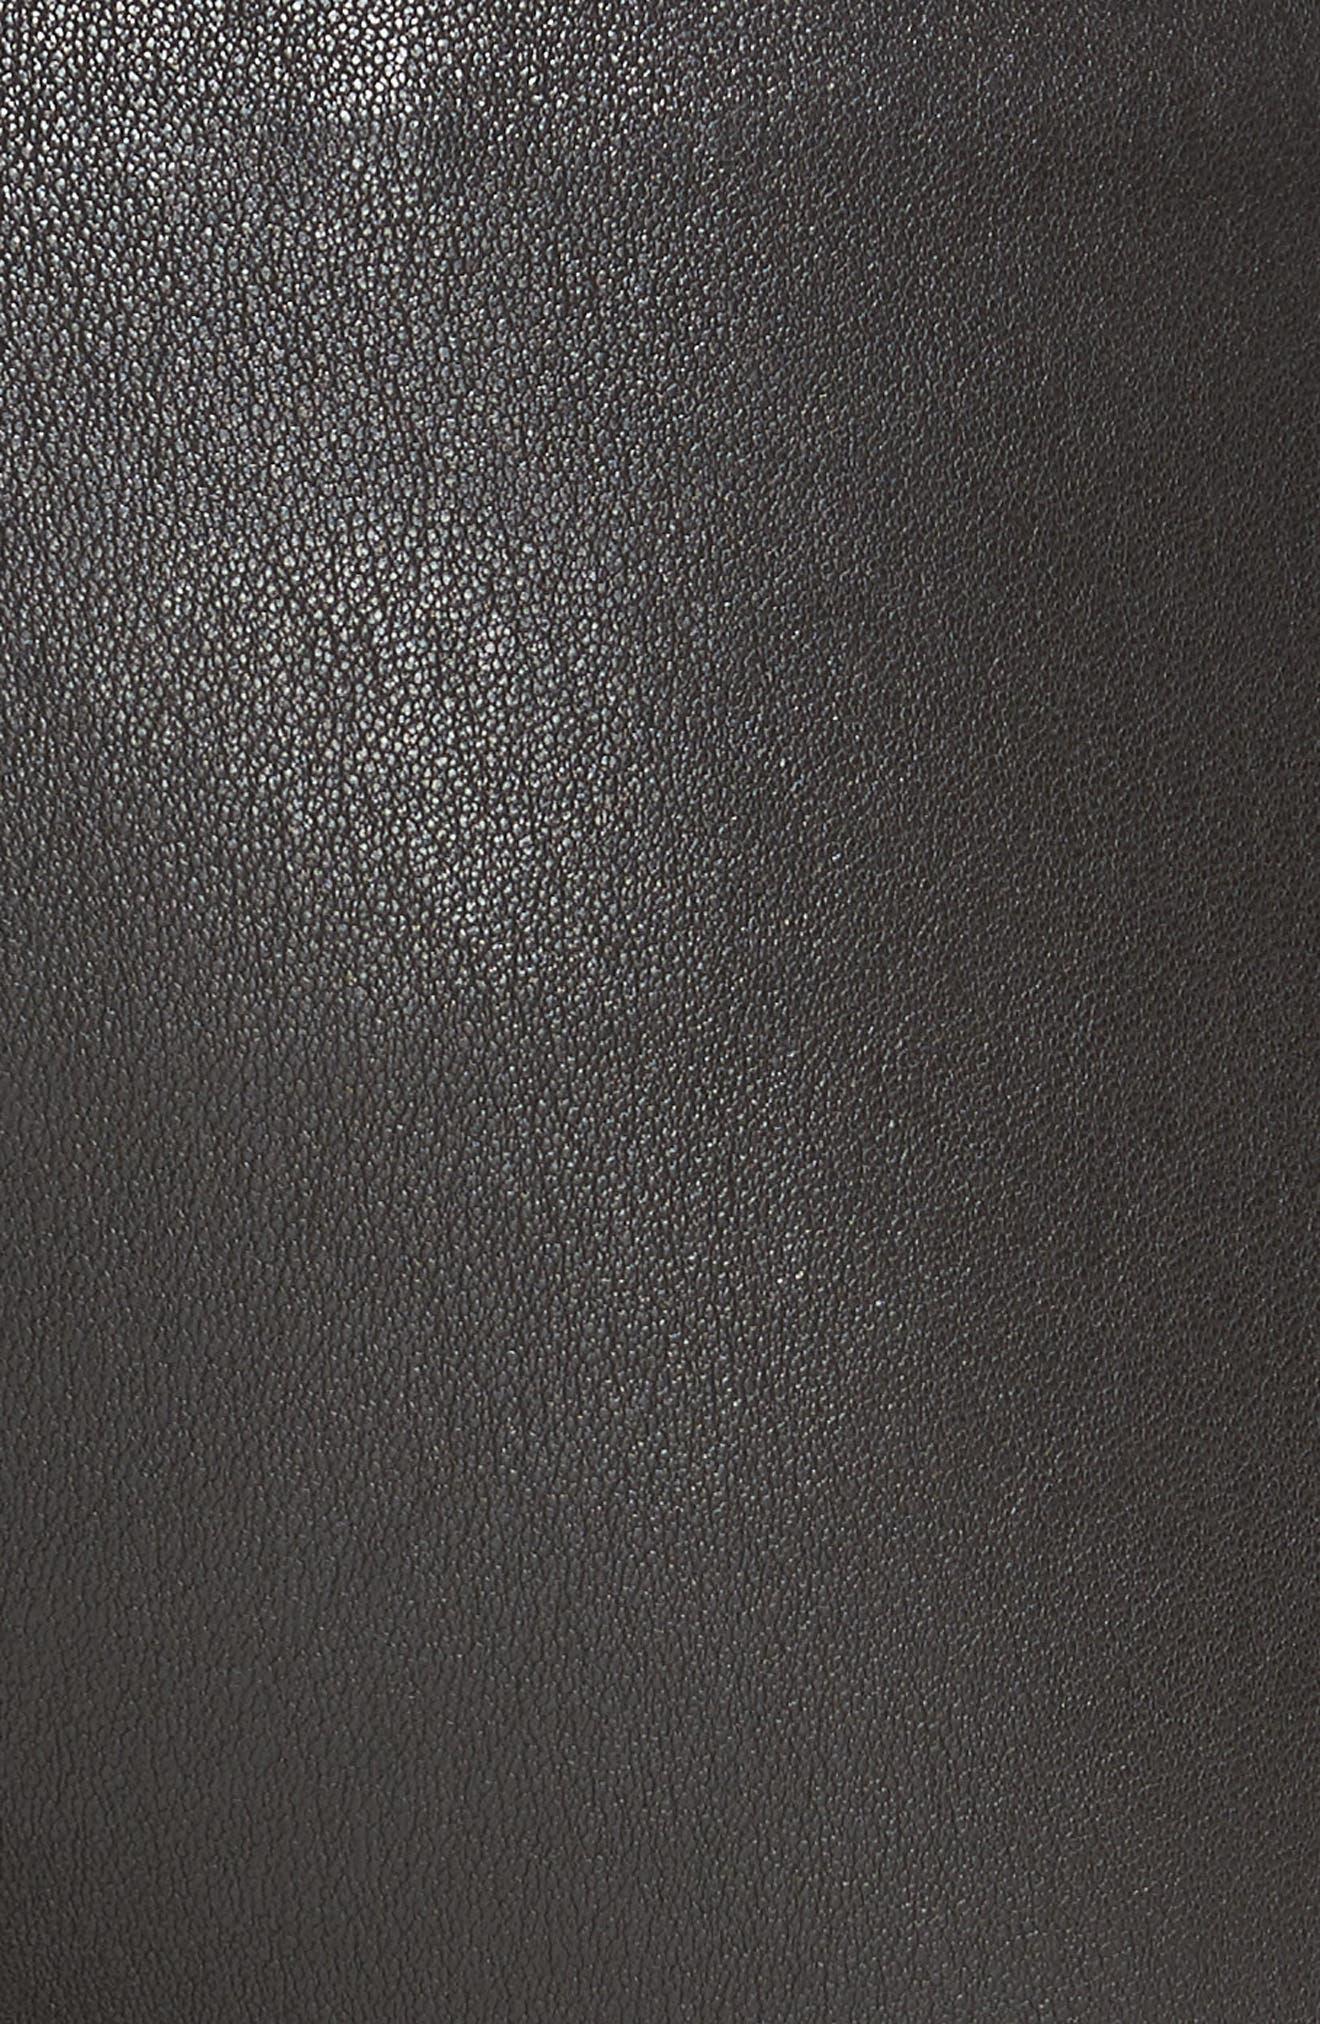 Stretch Lambskin Leather Leggings,                             Alternate thumbnail 5, color,                             BLACK